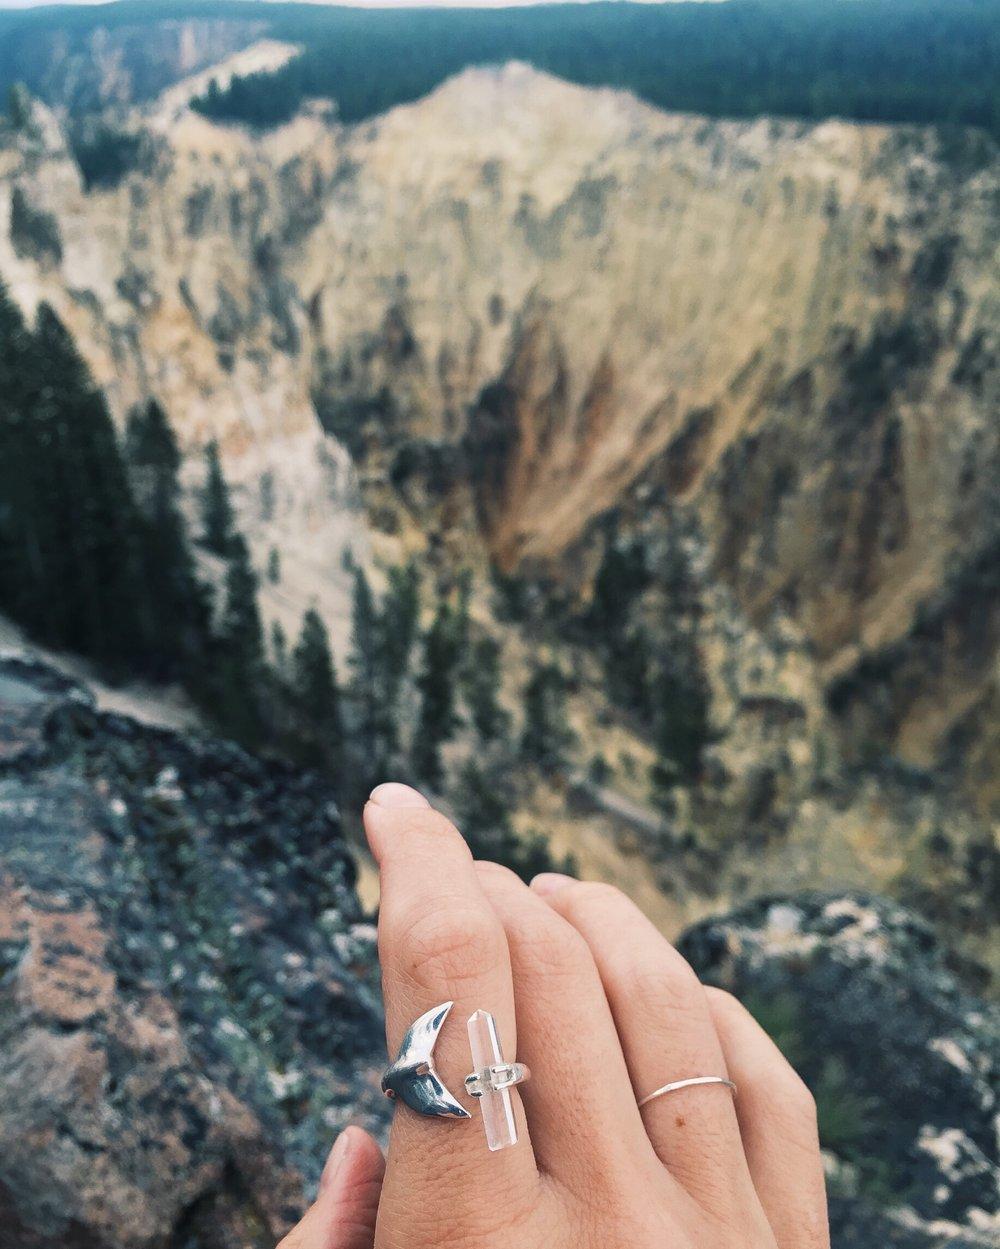 Overlooking Yellowstone's Grand Canyon.